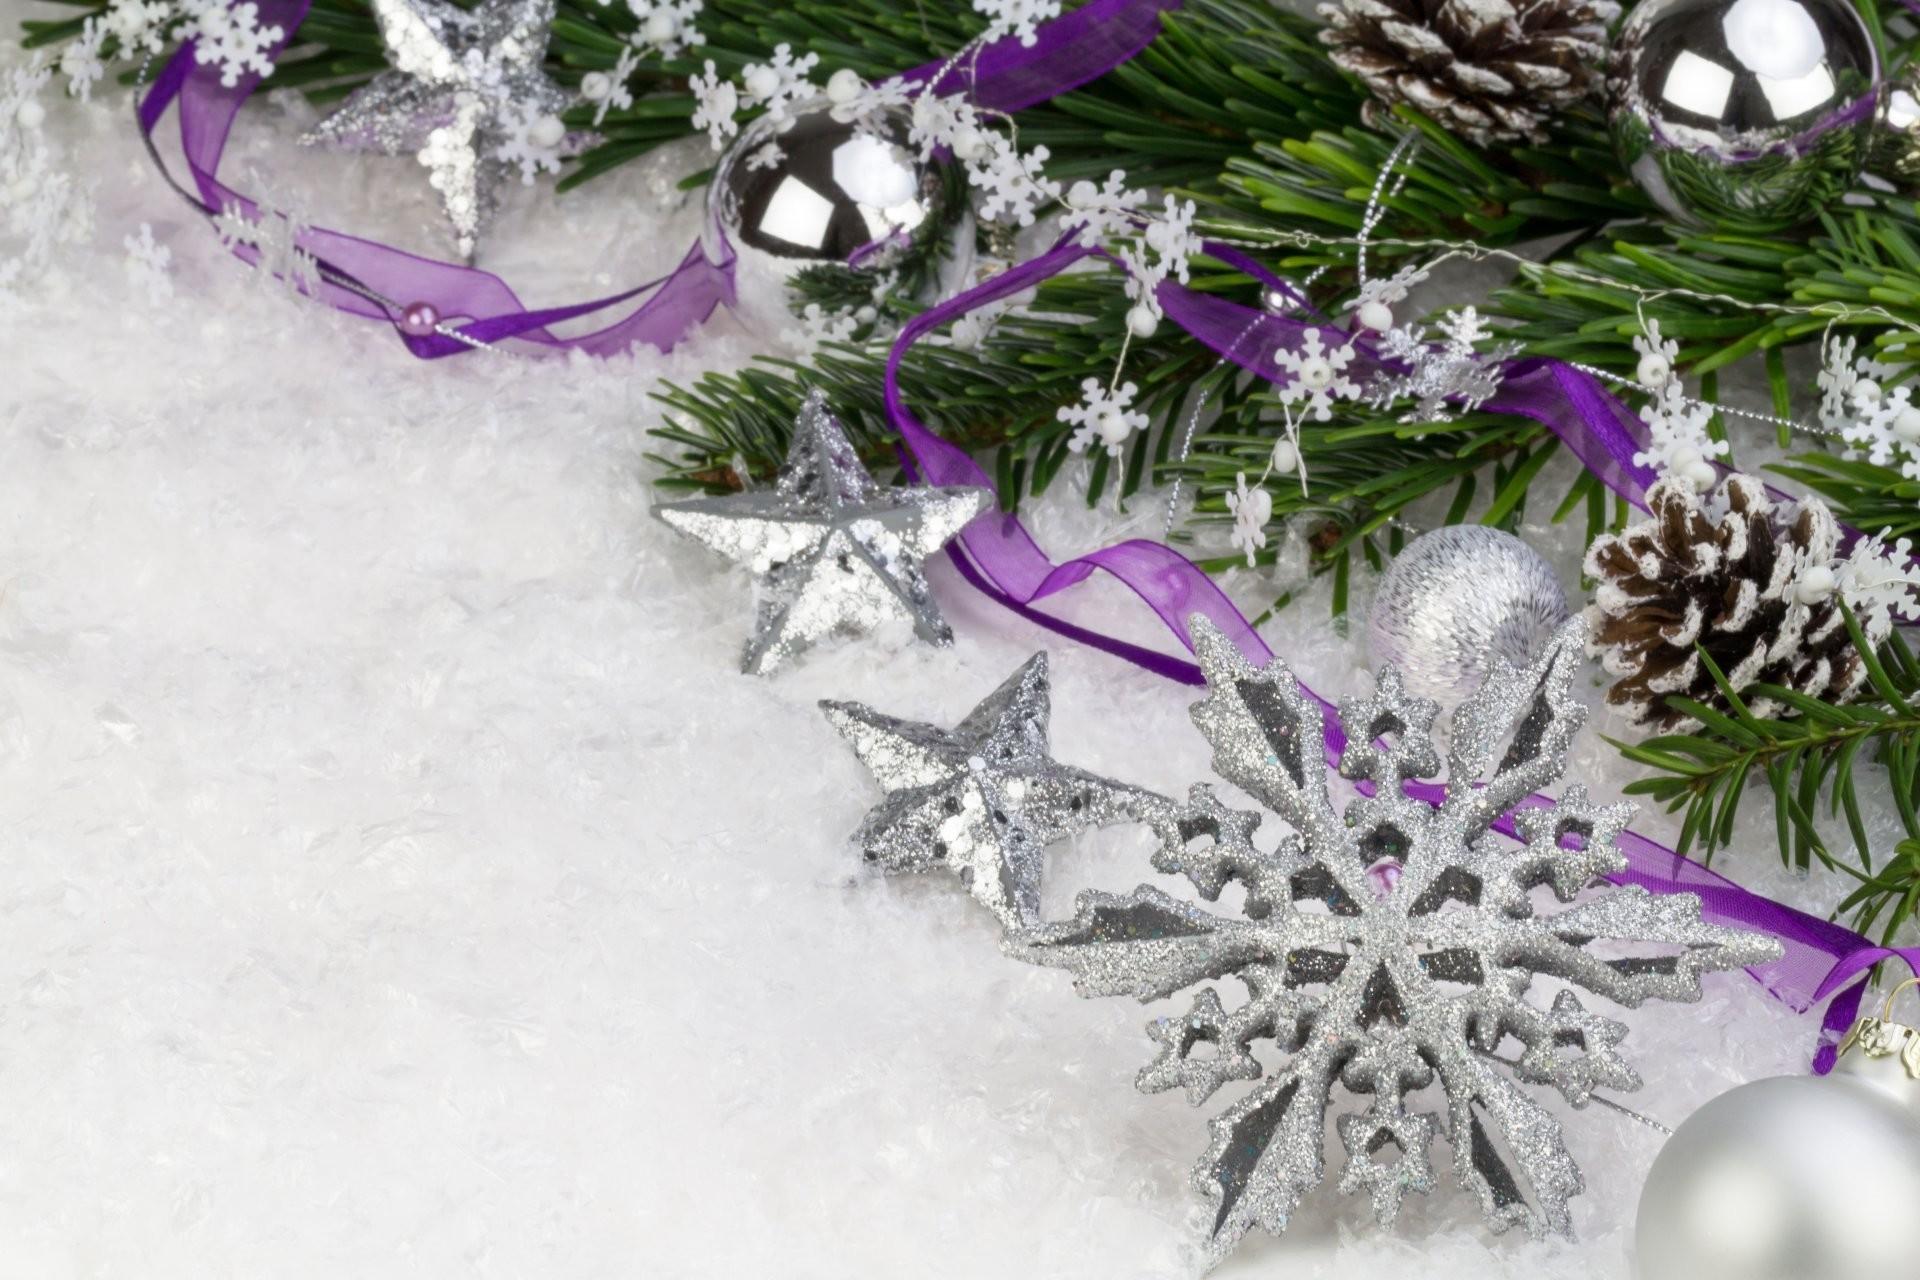 snowflake cone ribbon purple snow balls christmas star silver scenery  branch spruce new year christmas christmas